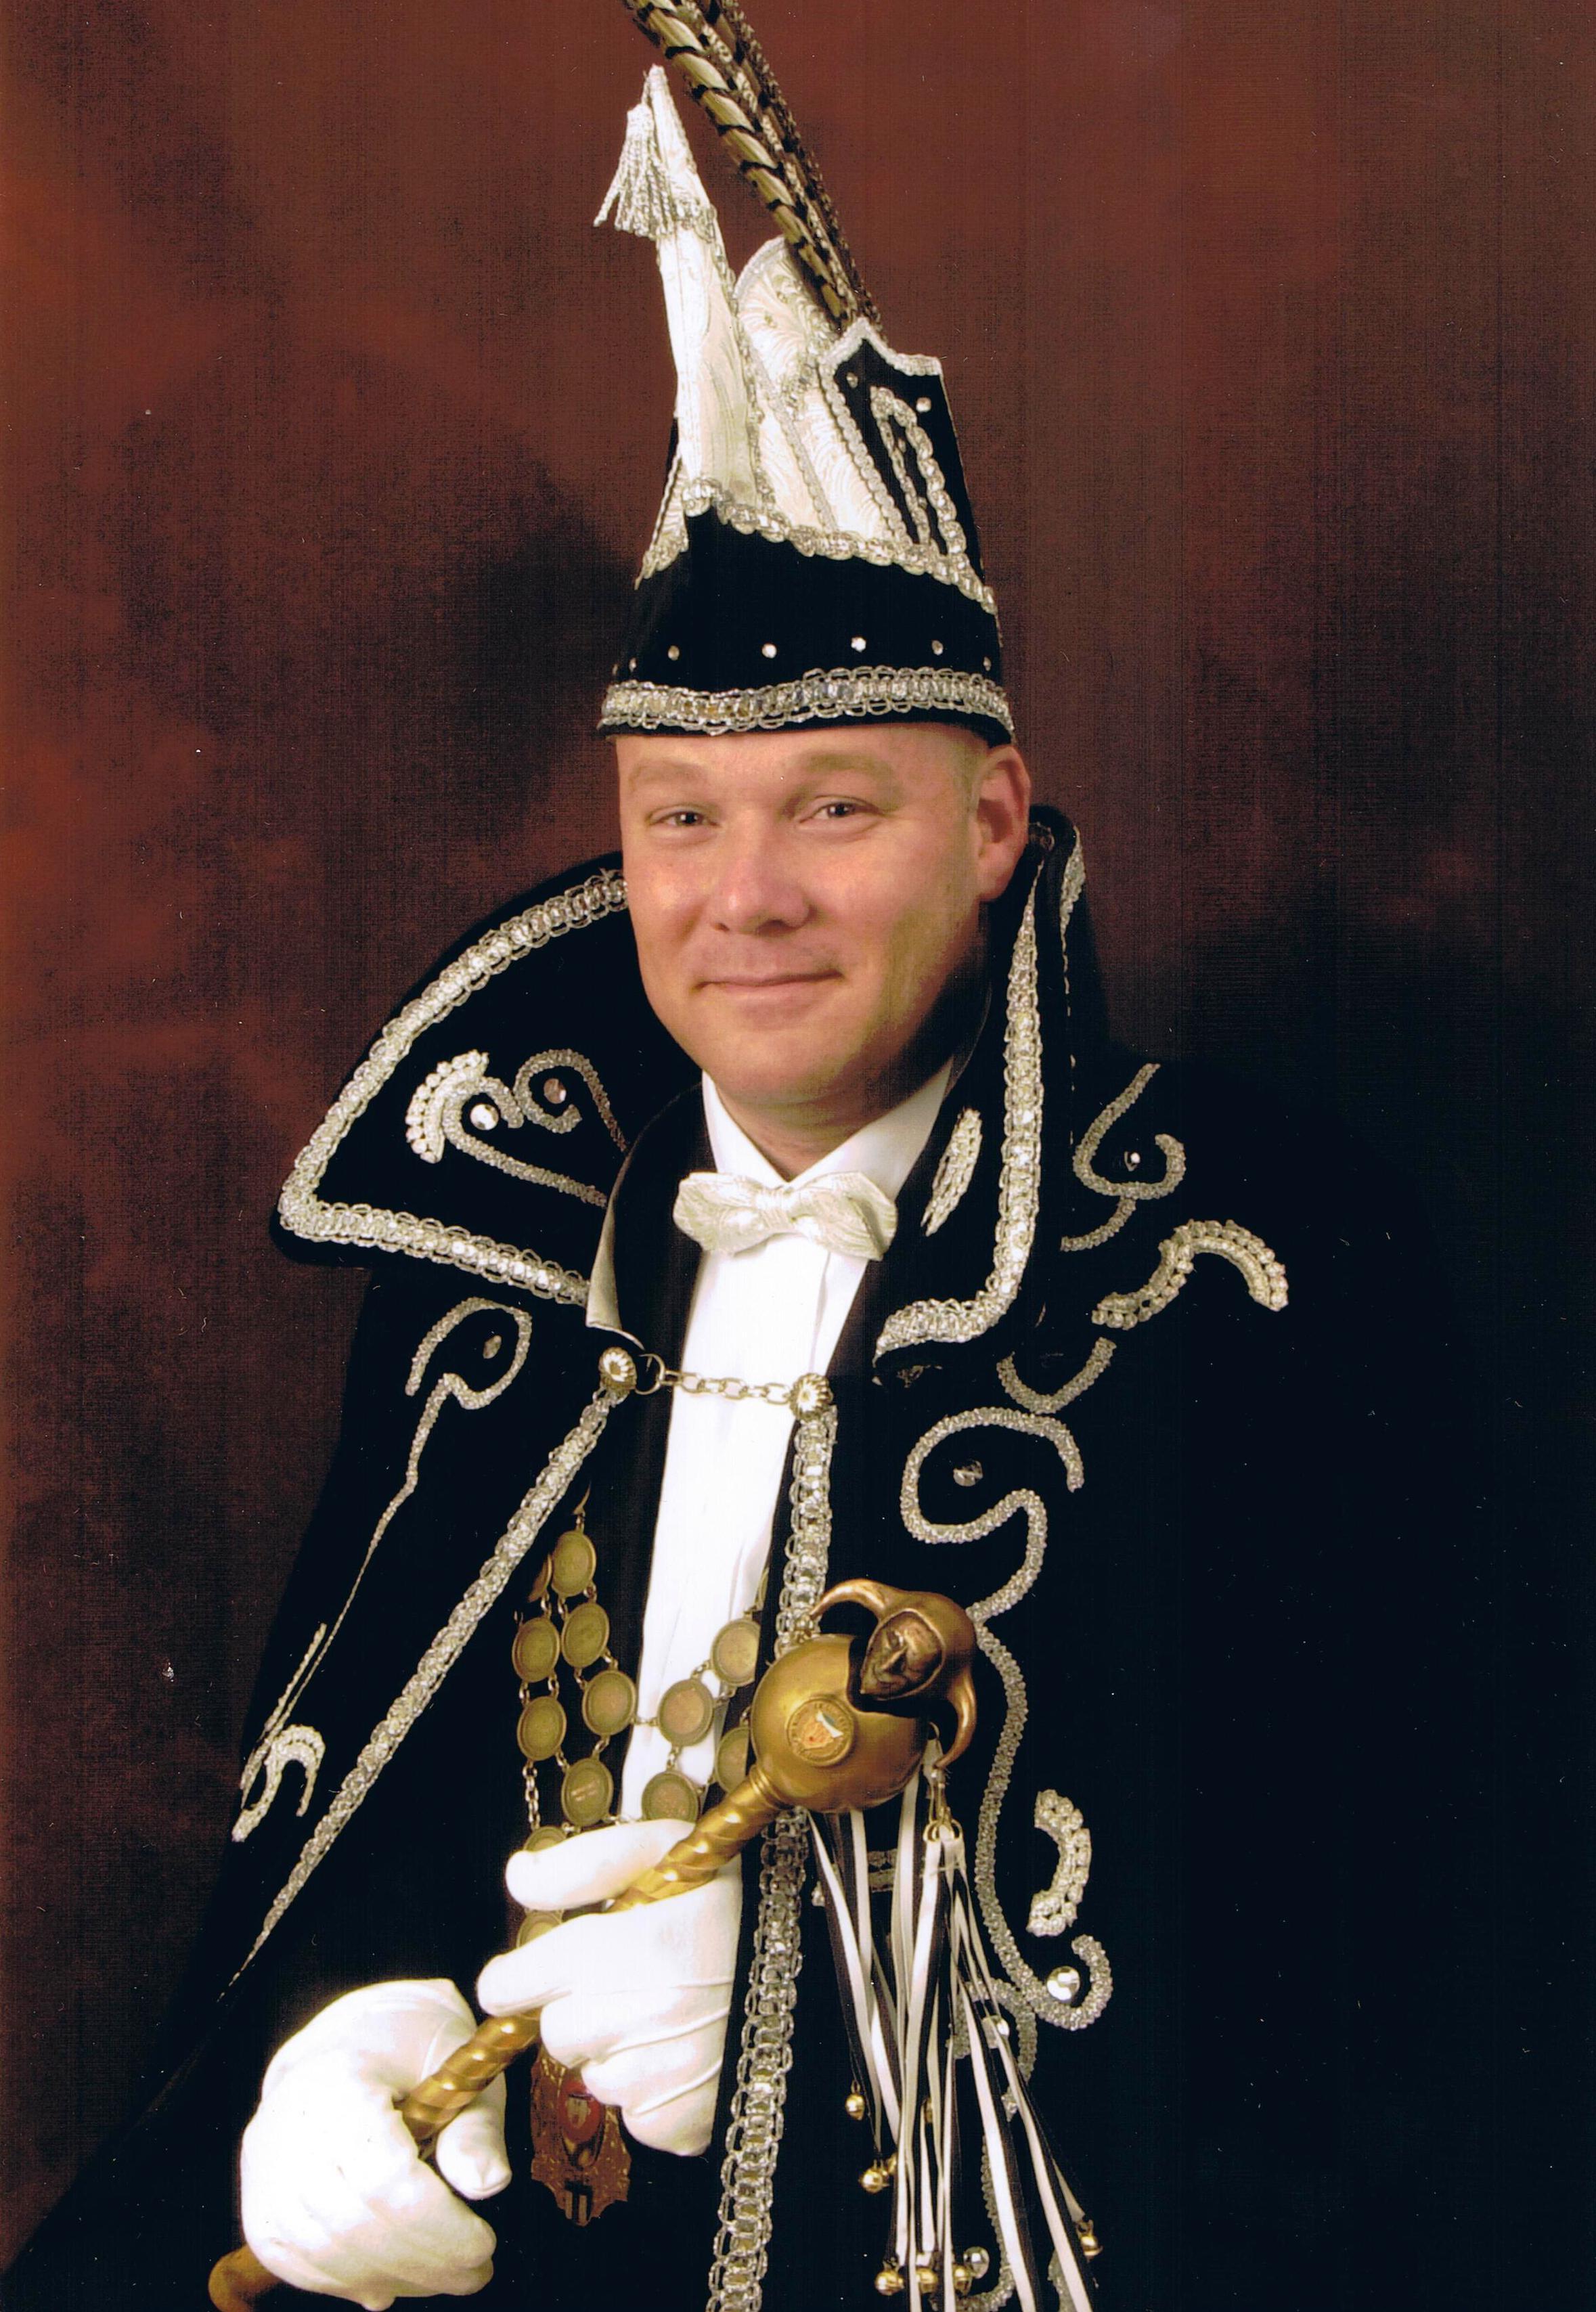 2005 2006 Prins Patrick de 1e Patrick Vrijmoed